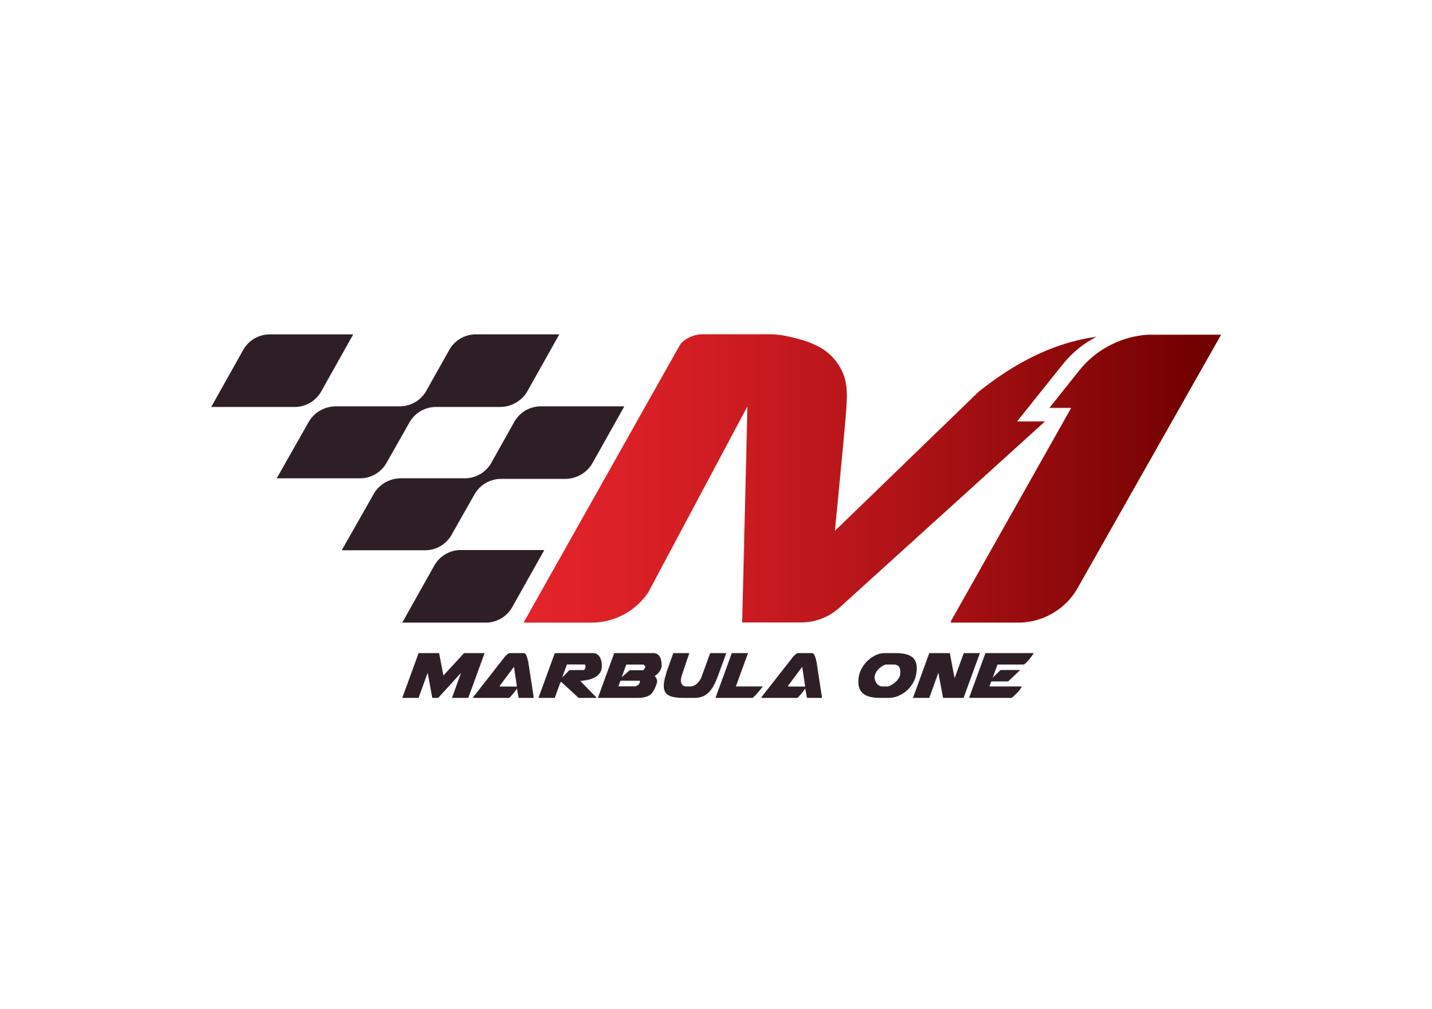 Marbula One